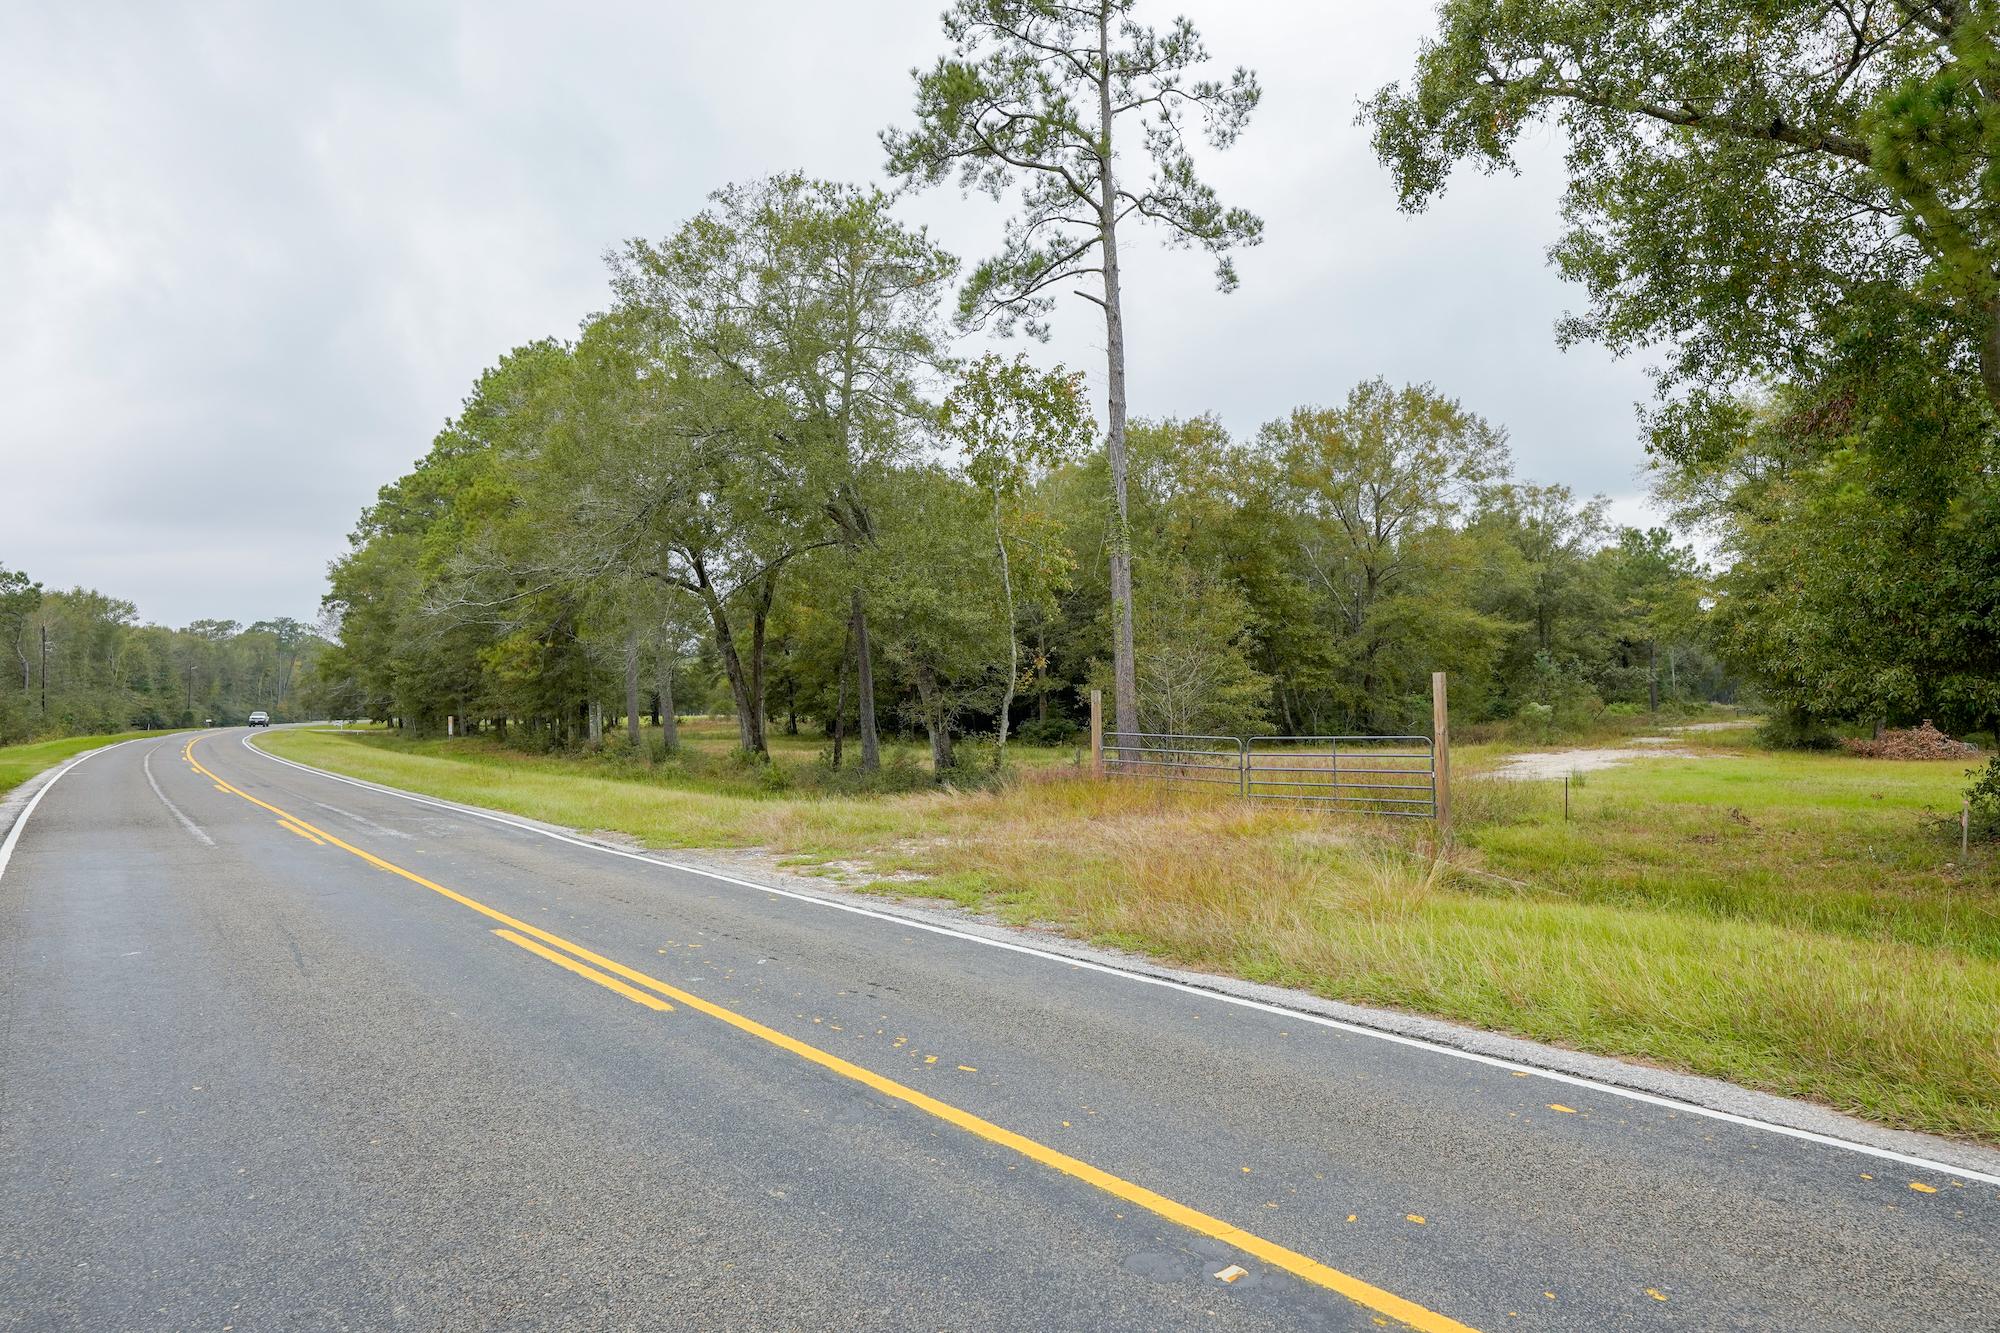 Jefferson County Development Land - Image 36 of 36